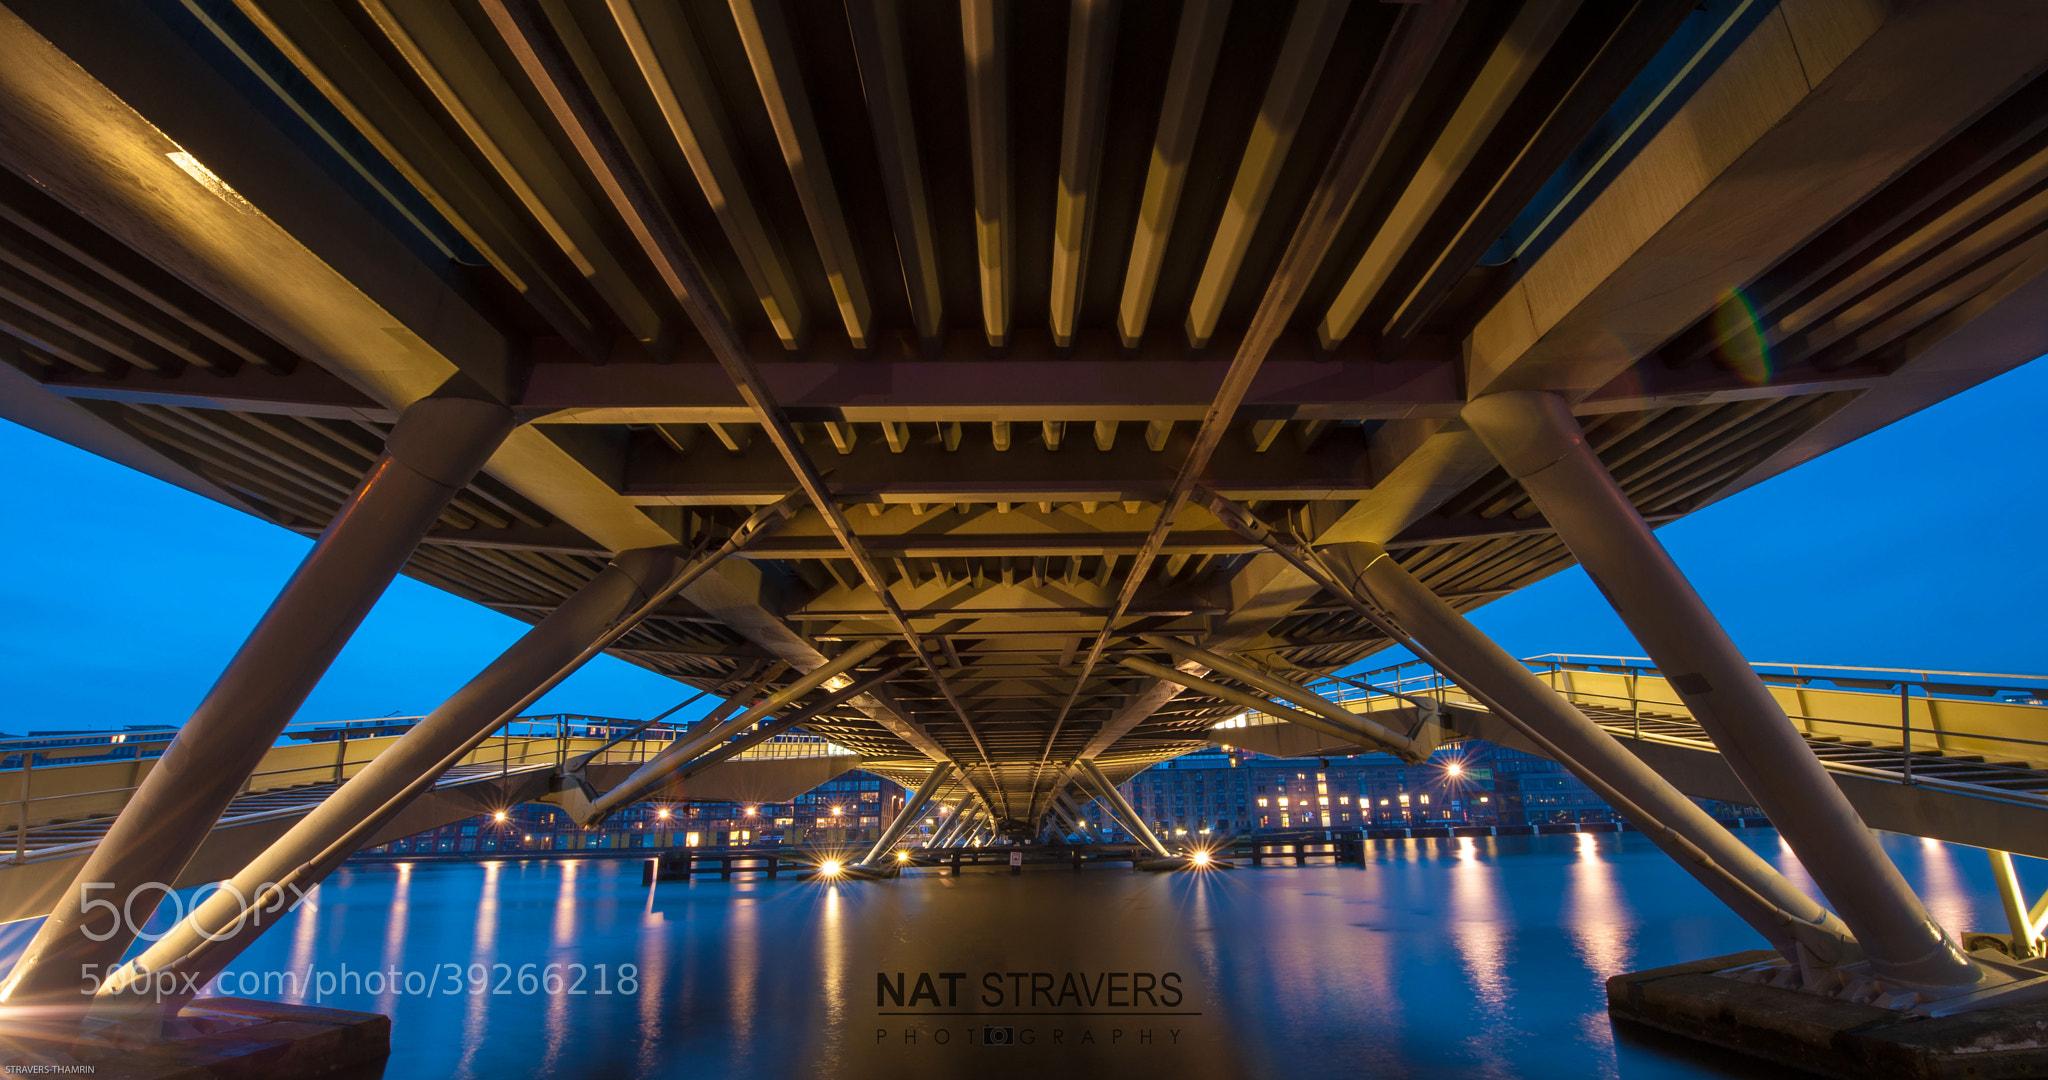 Photograph The Jan Schaefer Bridge by Nathalie Stravers on 500px